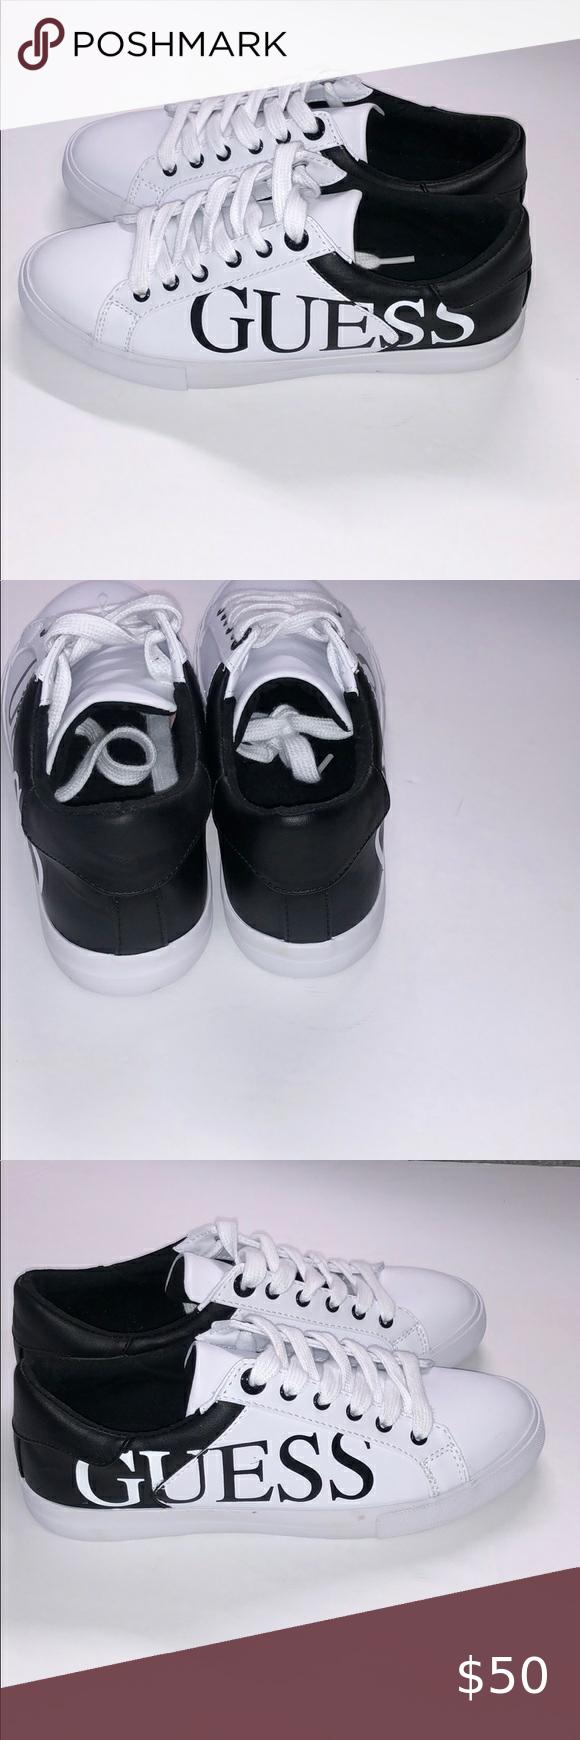 Black sneakers, Guess sneakers